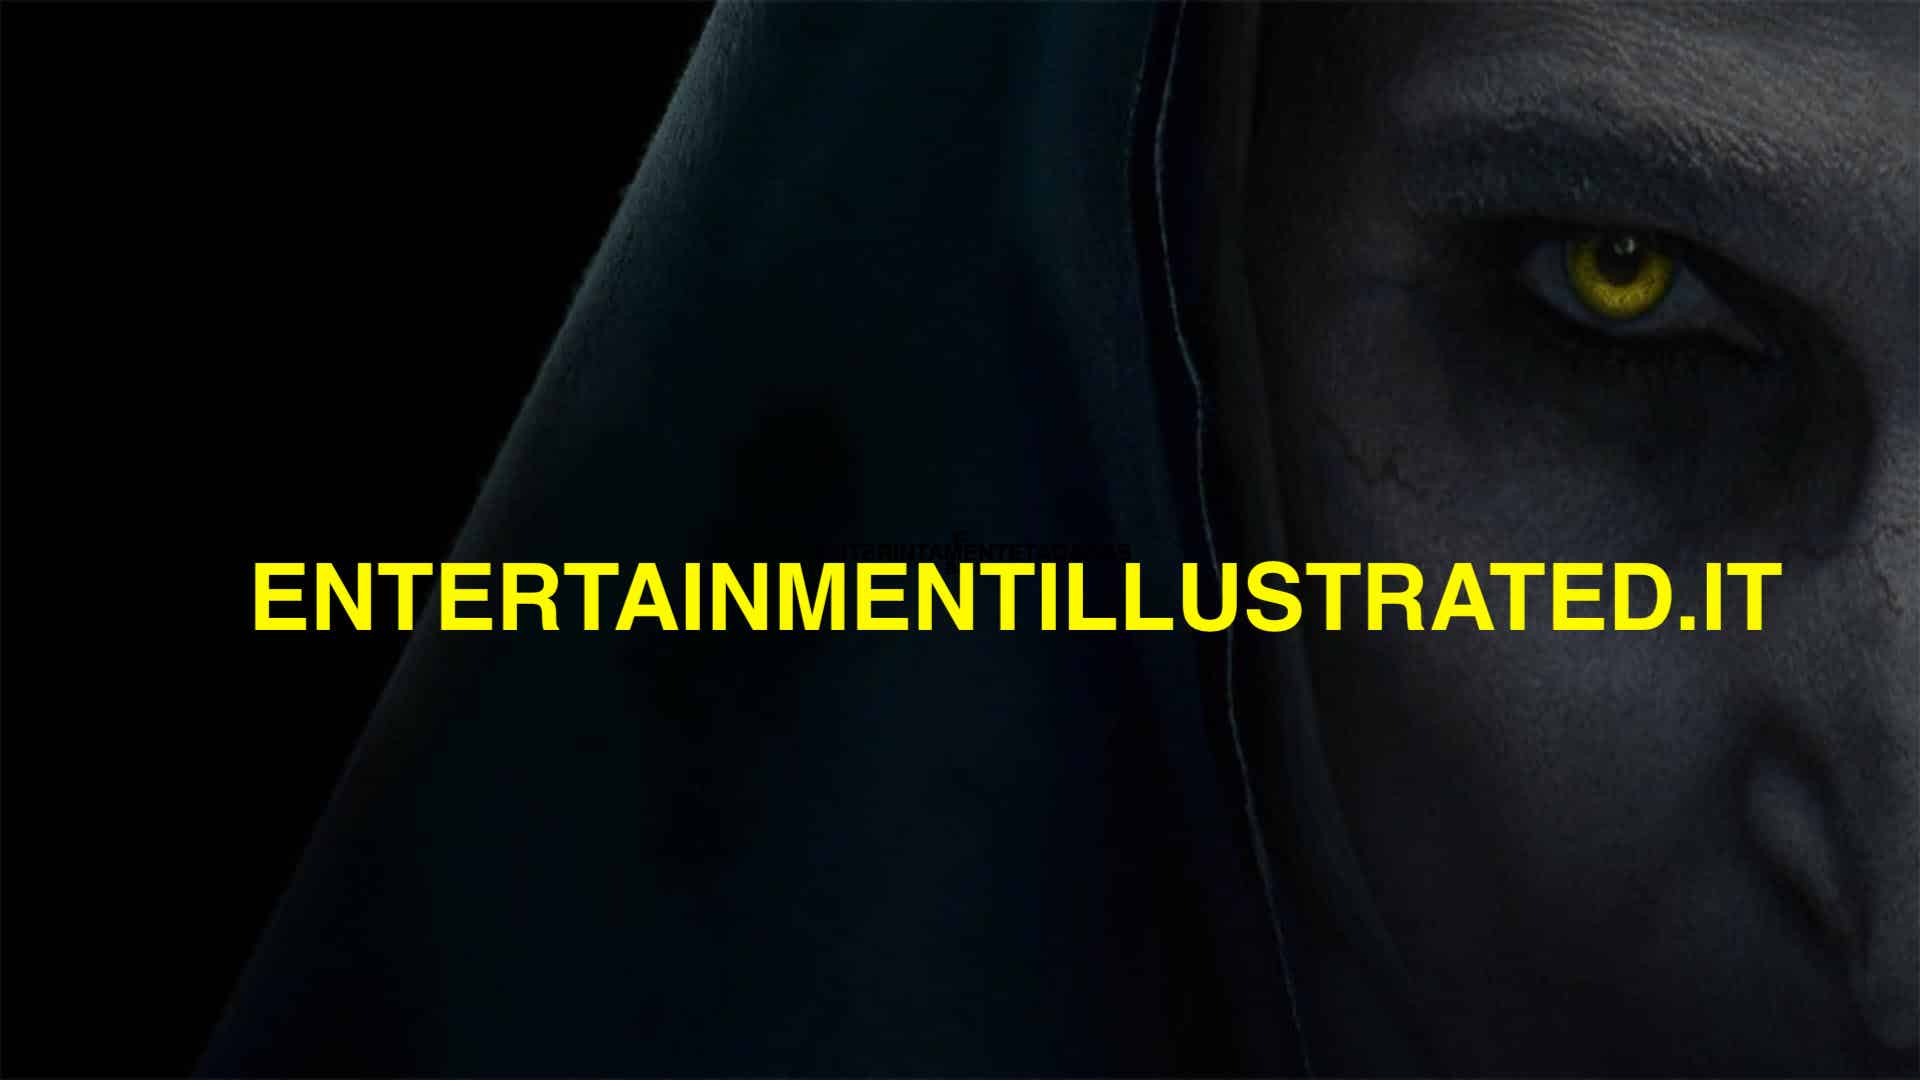 Star Wars in realtà aumentata per tutti i fan